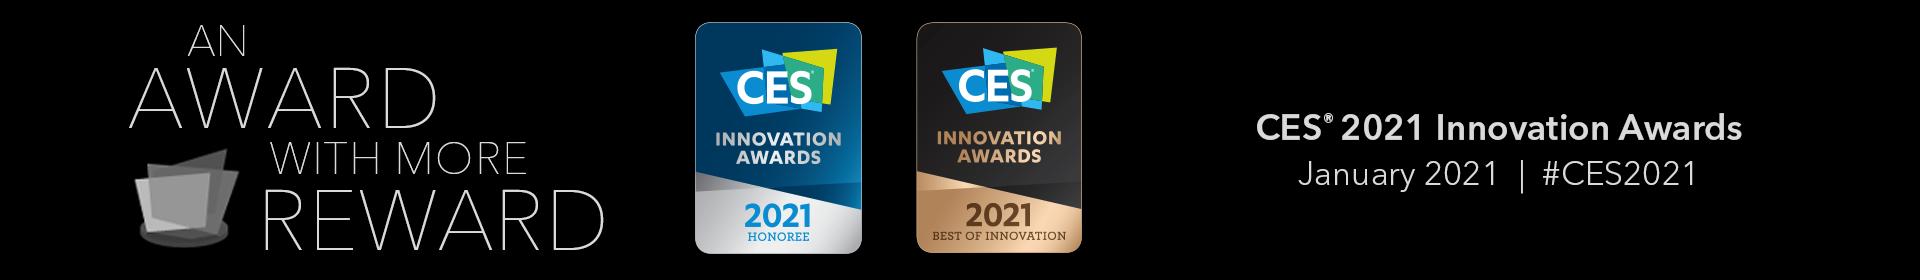 CES 2021 Innovation Awards Event Banner